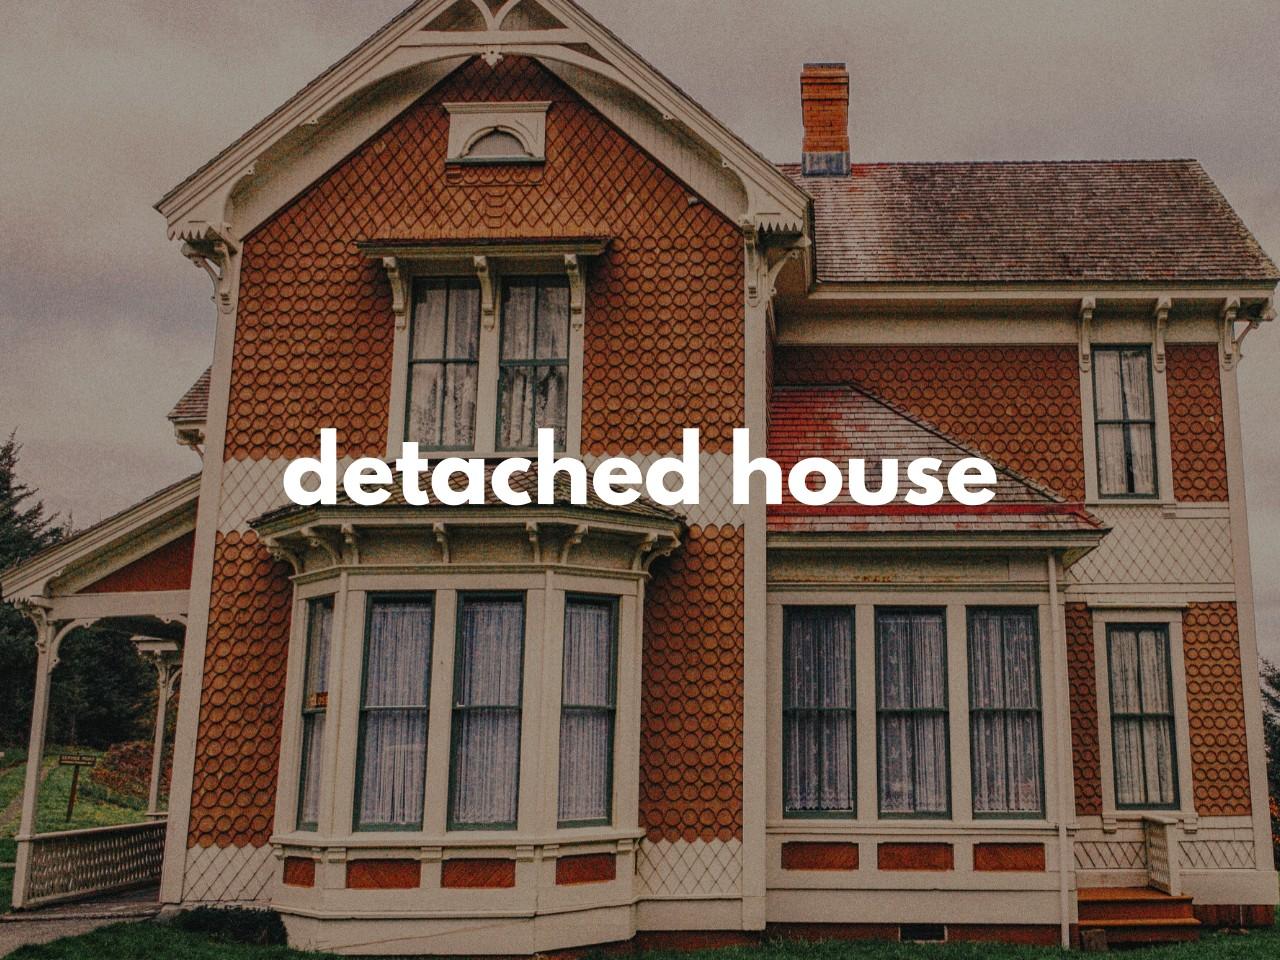 detached house : 一戸建て